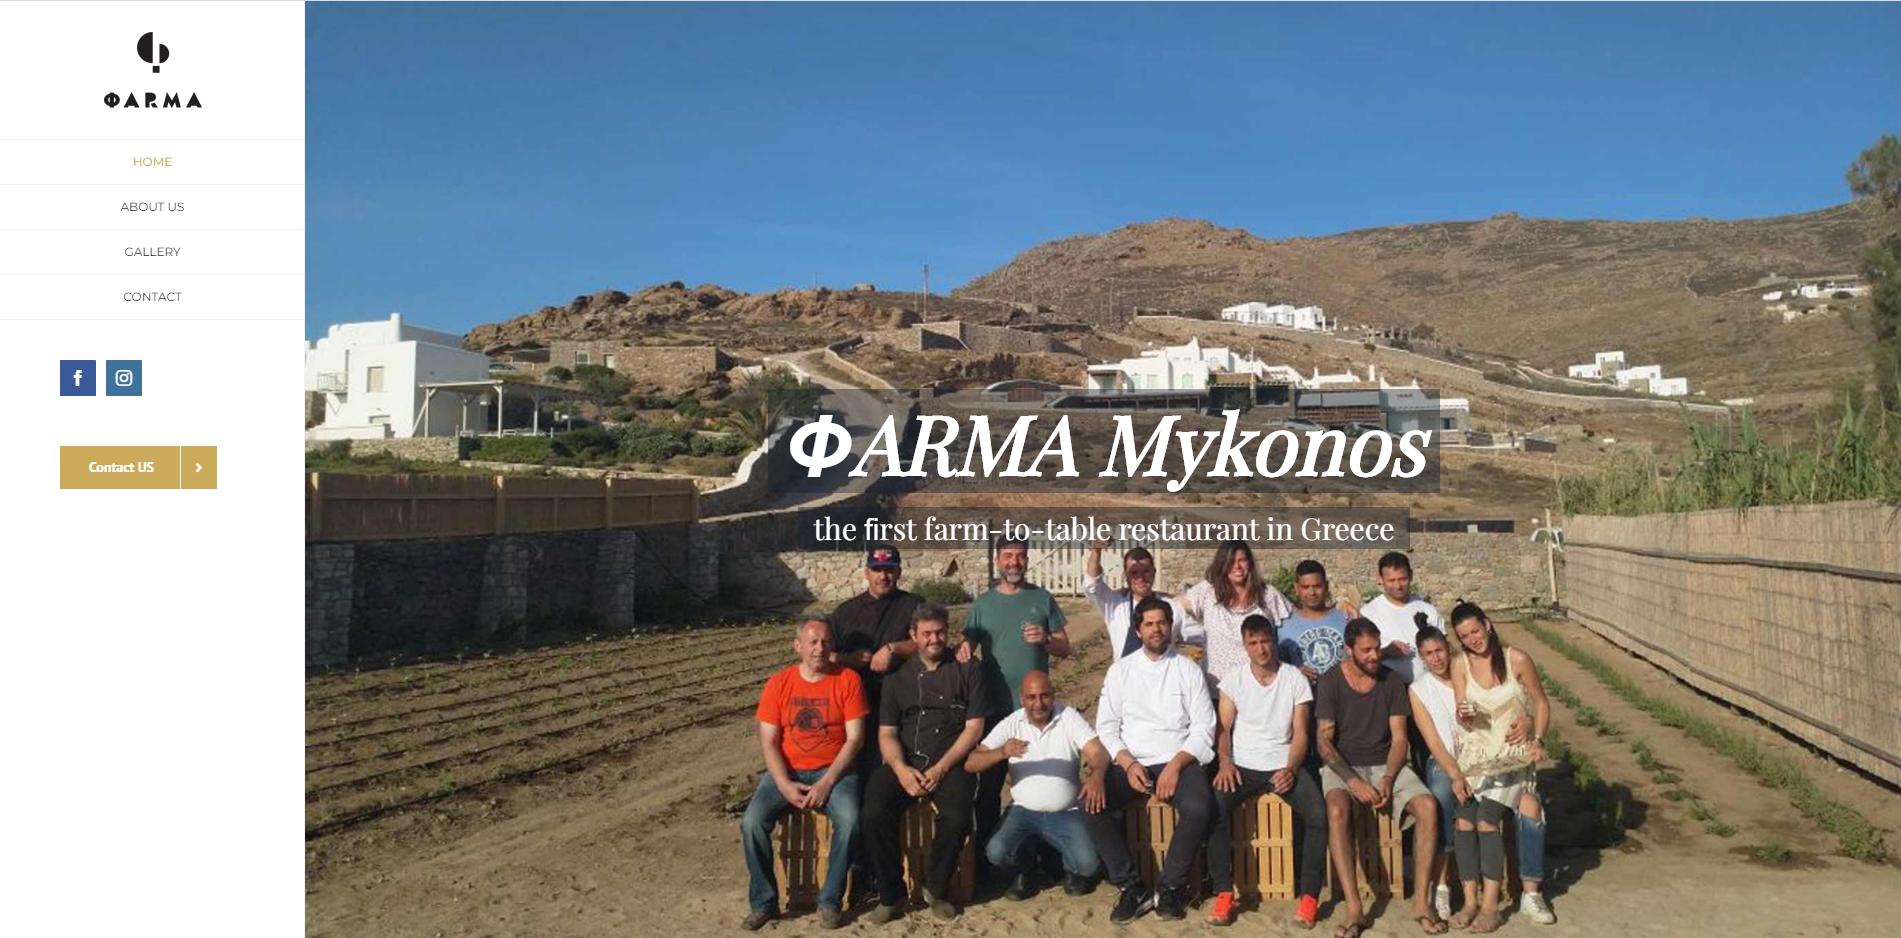 Farma Mykonos web site